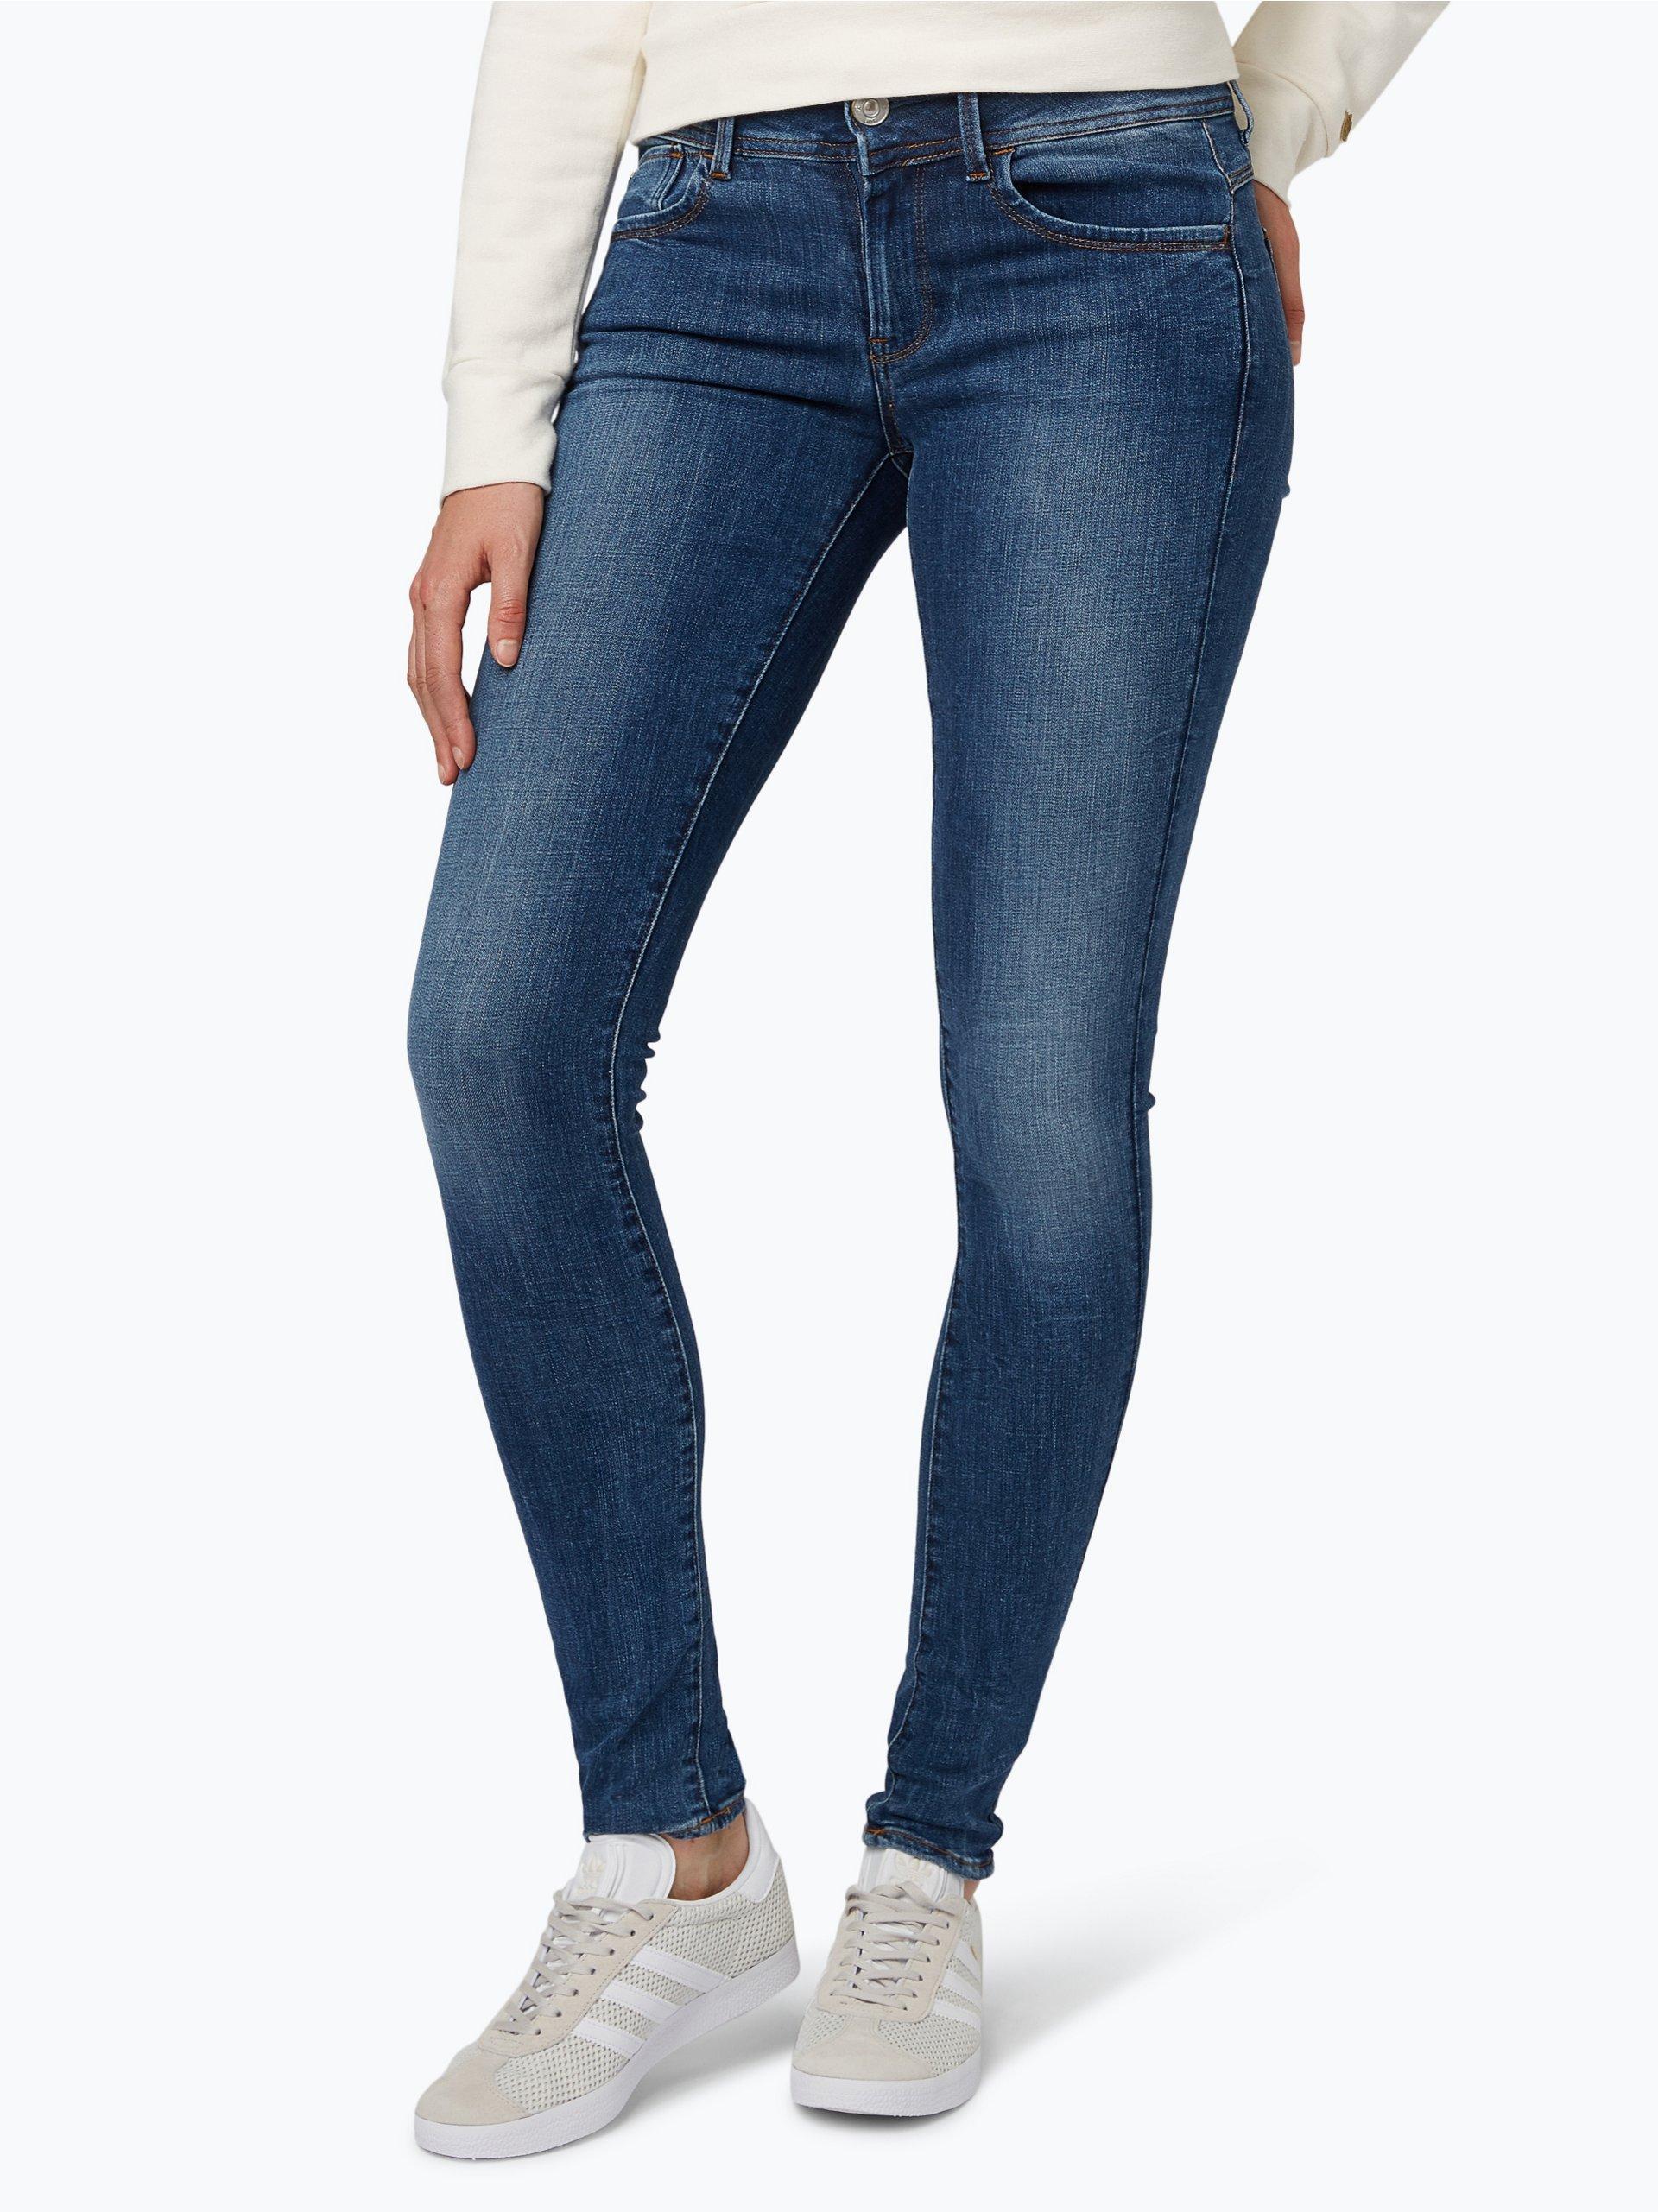 g star damen jeans lynn blau blue stone uni online. Black Bedroom Furniture Sets. Home Design Ideas